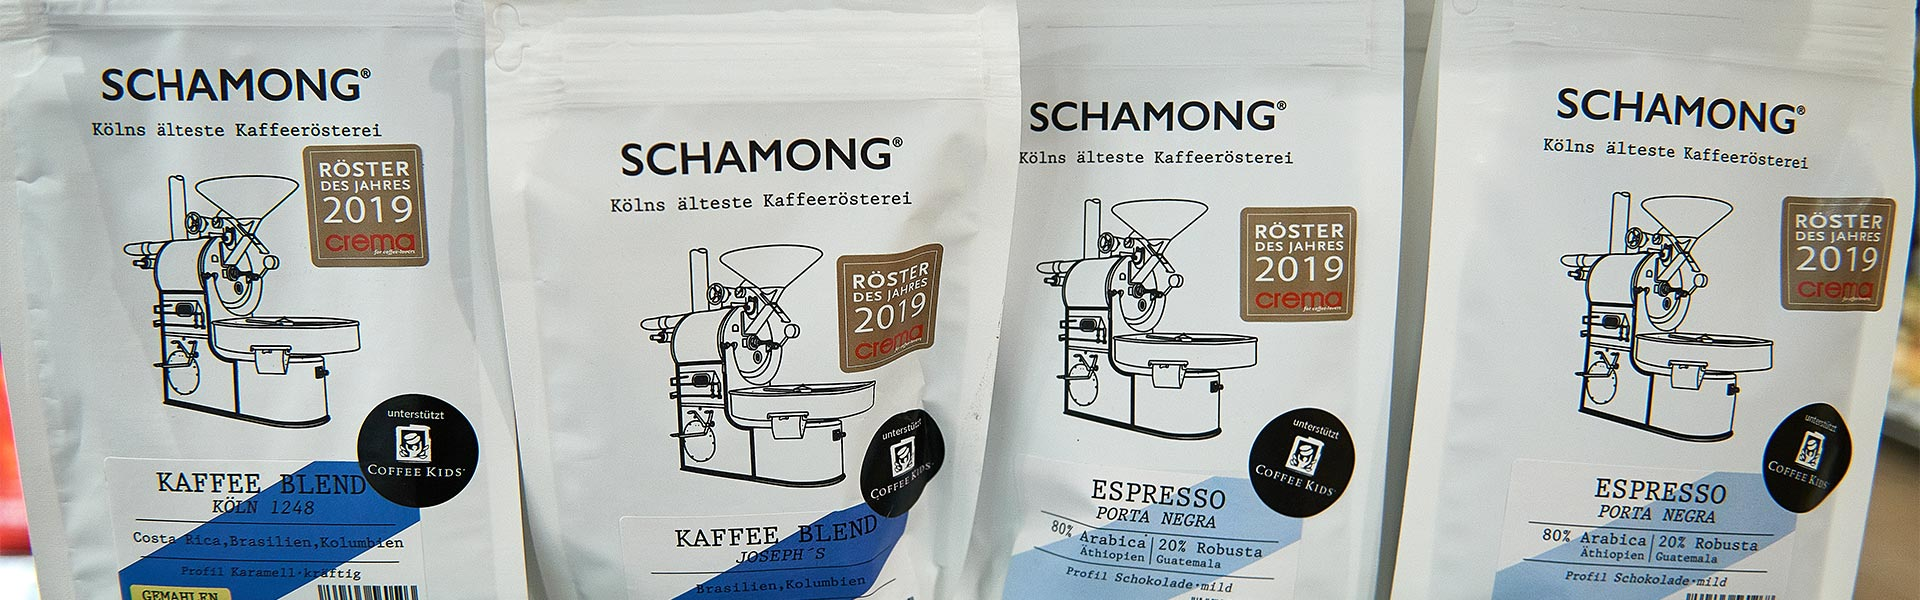 Kaffee aus Köln